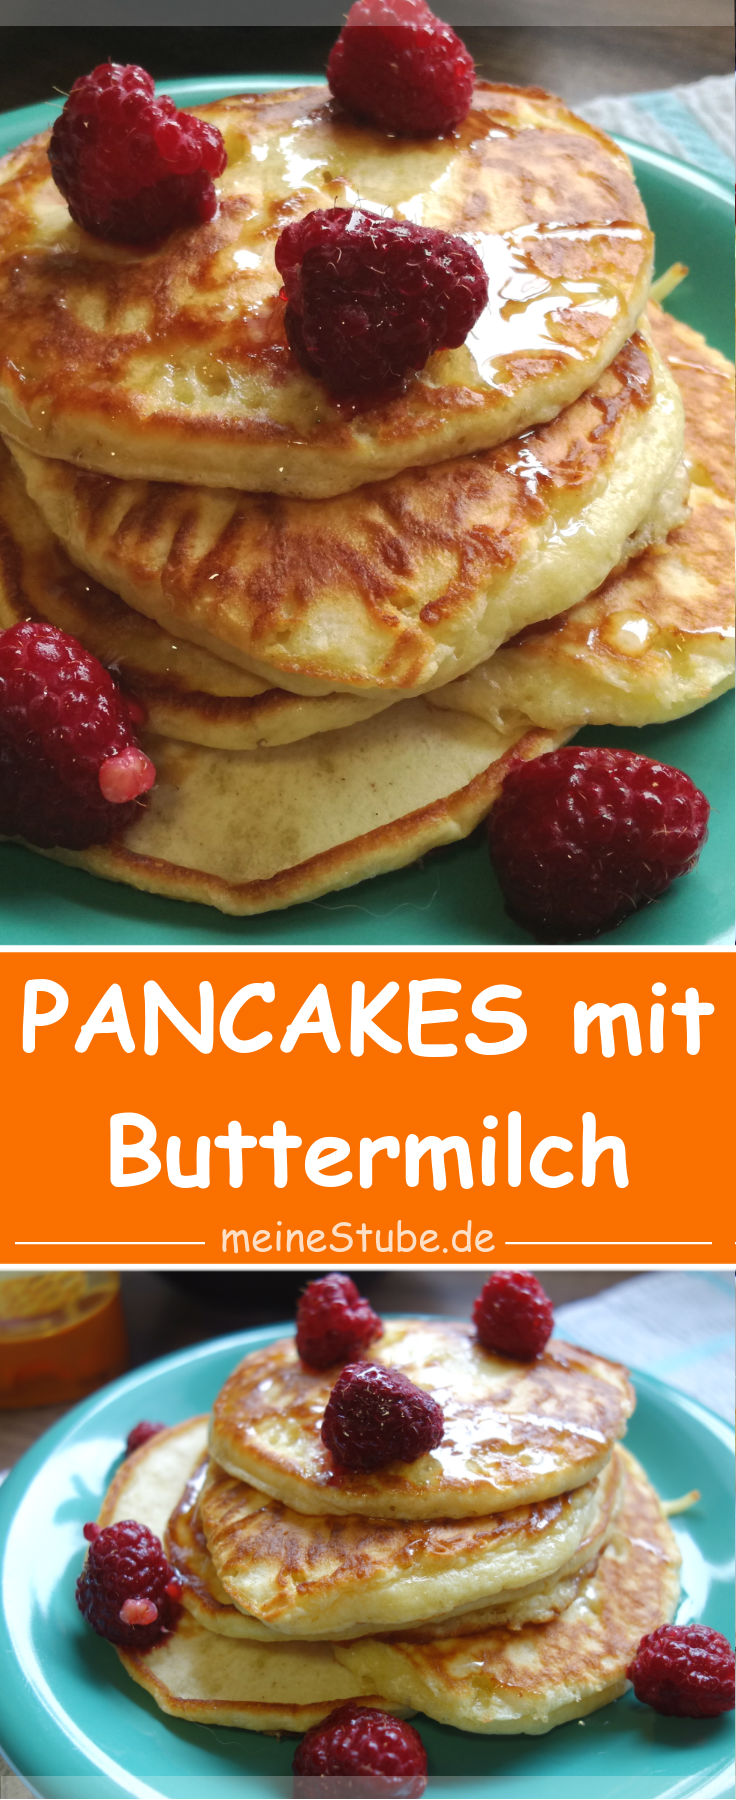 Pancakes-buttermilch-usa.jpg